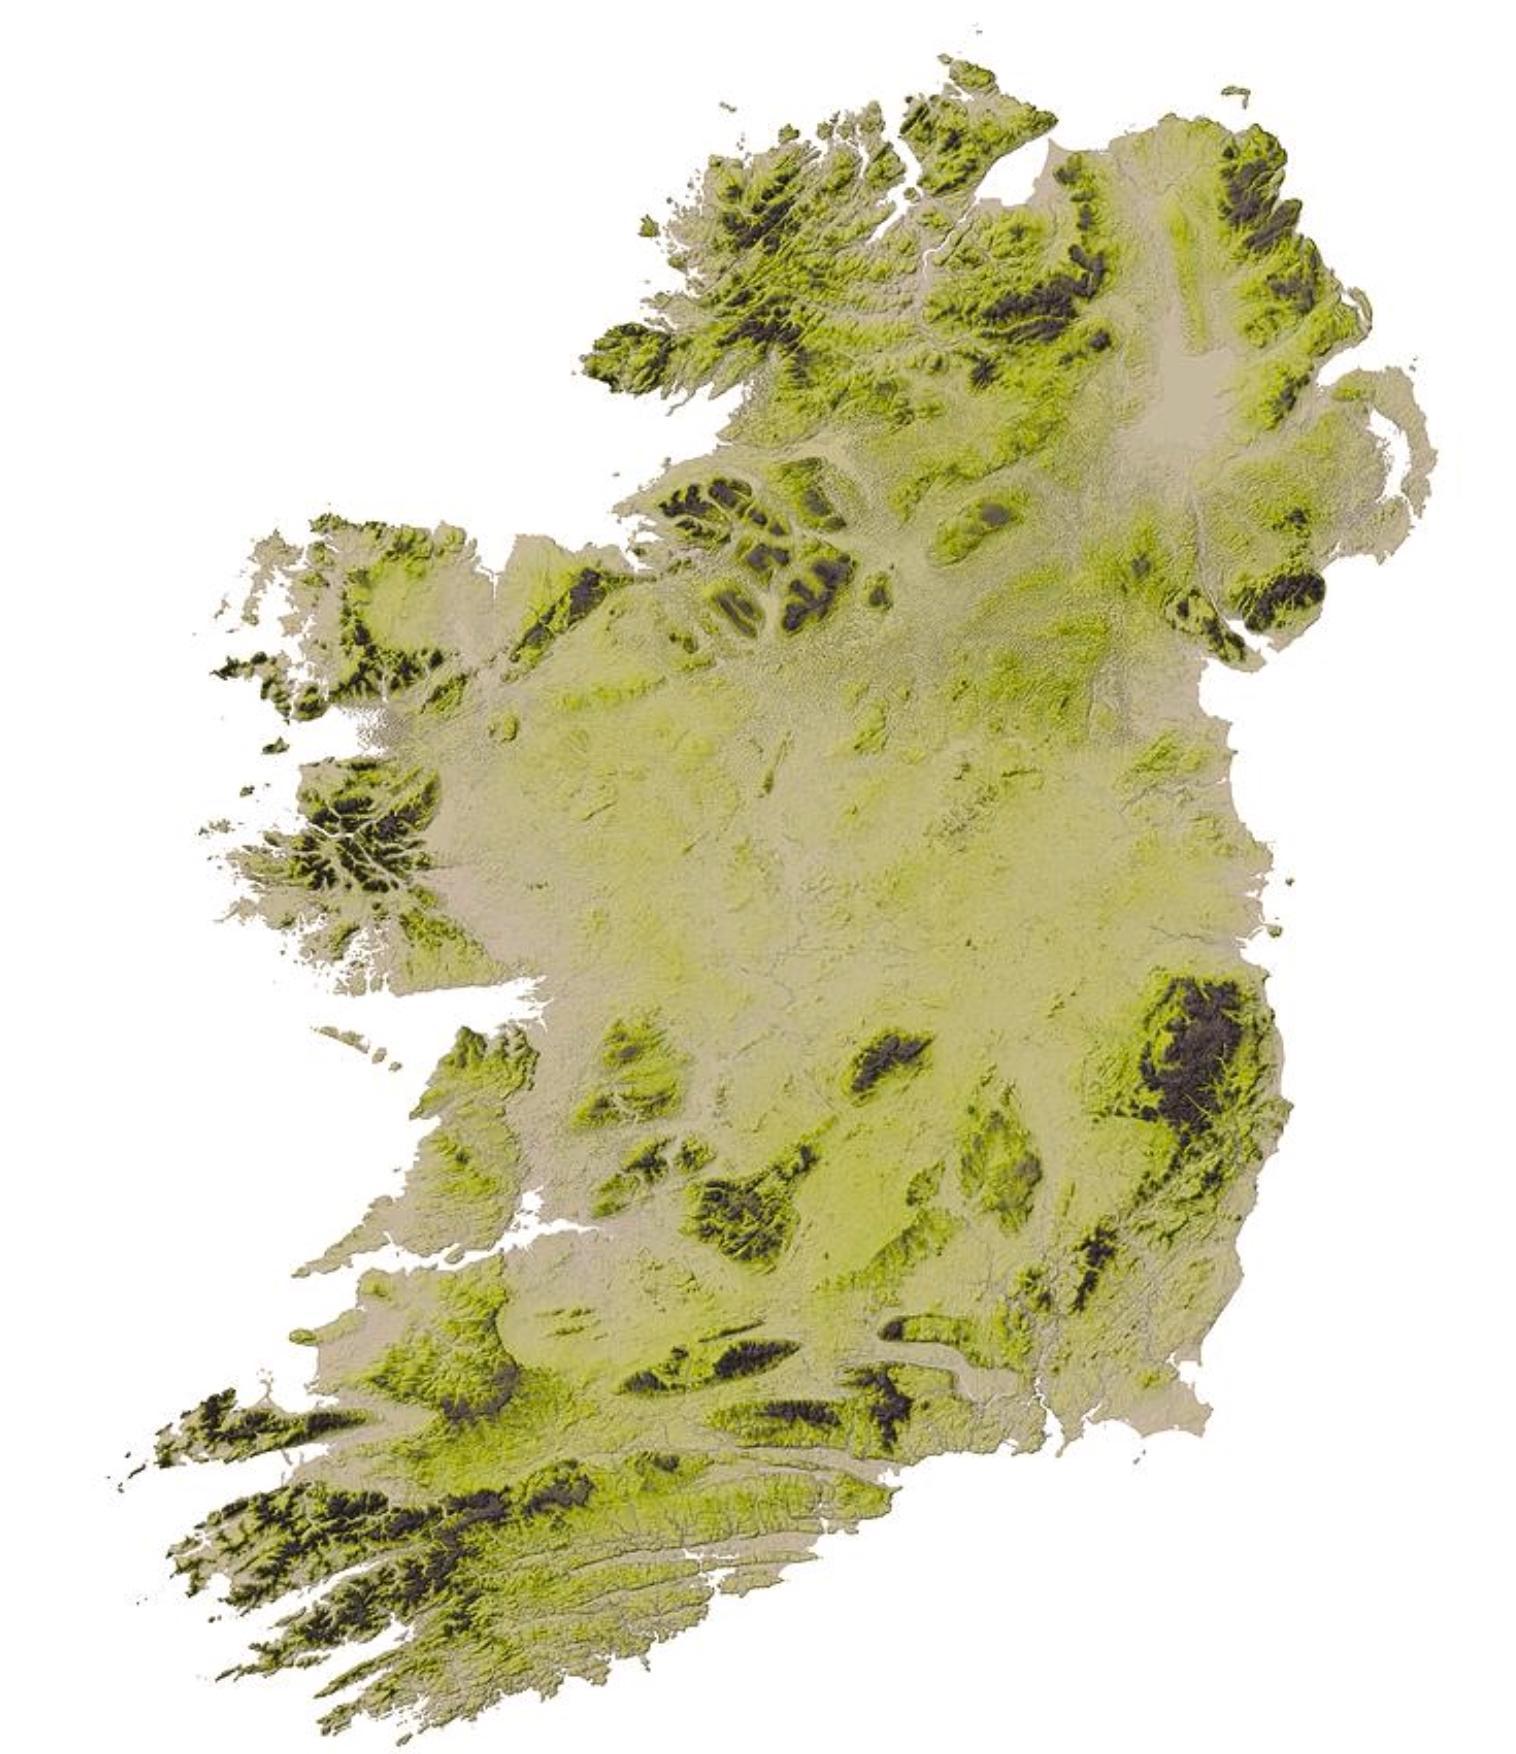 Cartina Geografica Dell Irlanda.Irlanda Topografica Cartina Mappa Geografica Dell Irlanda Europa Del Nord Europa